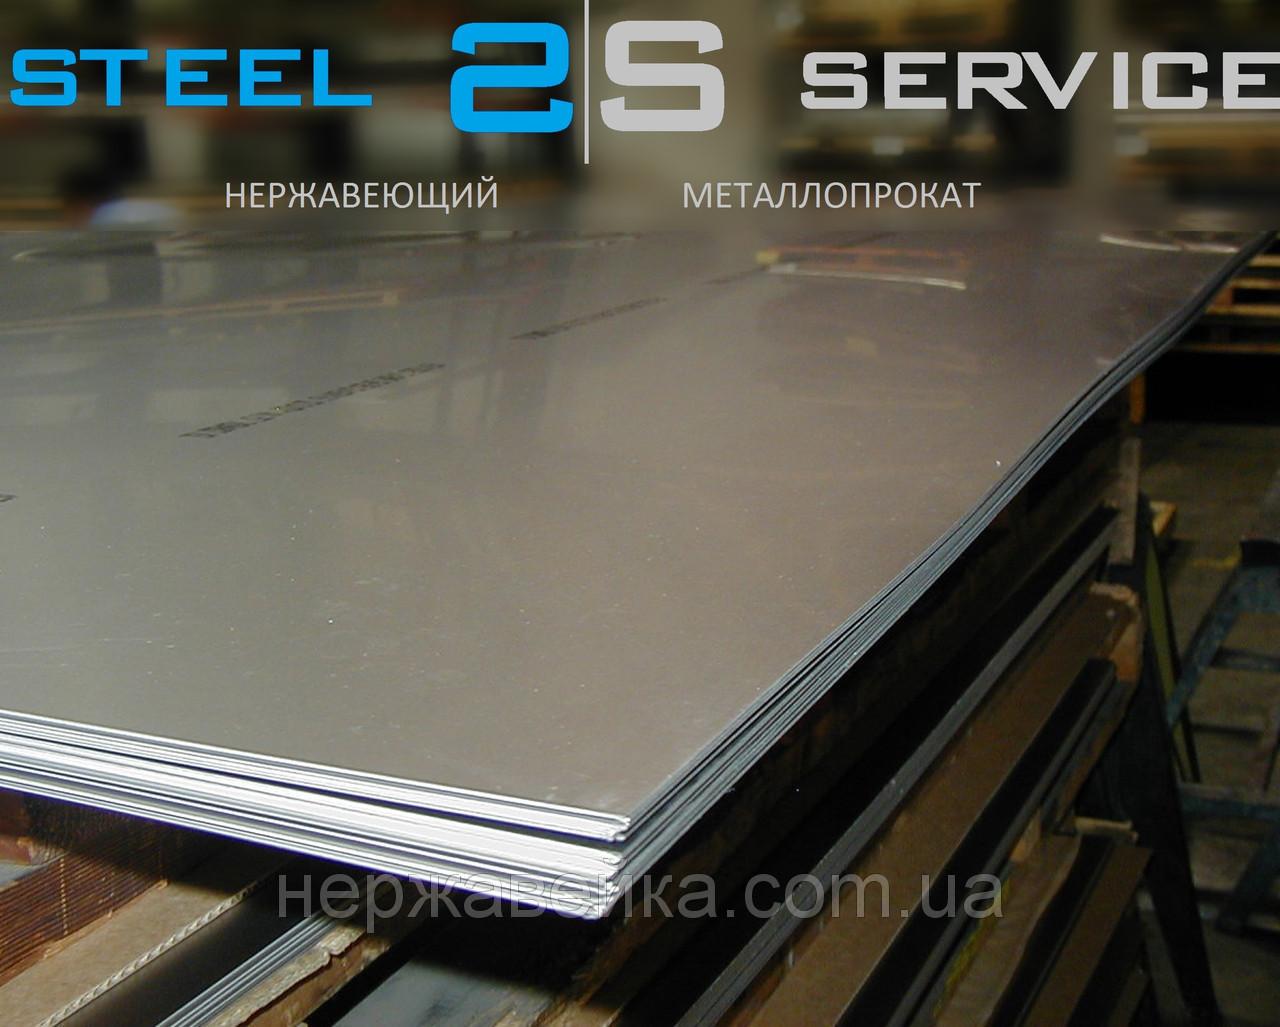 Нержавейка лист 8х1500х3000мм AISI 409(08Х13) F1 - горячекатанный, технический